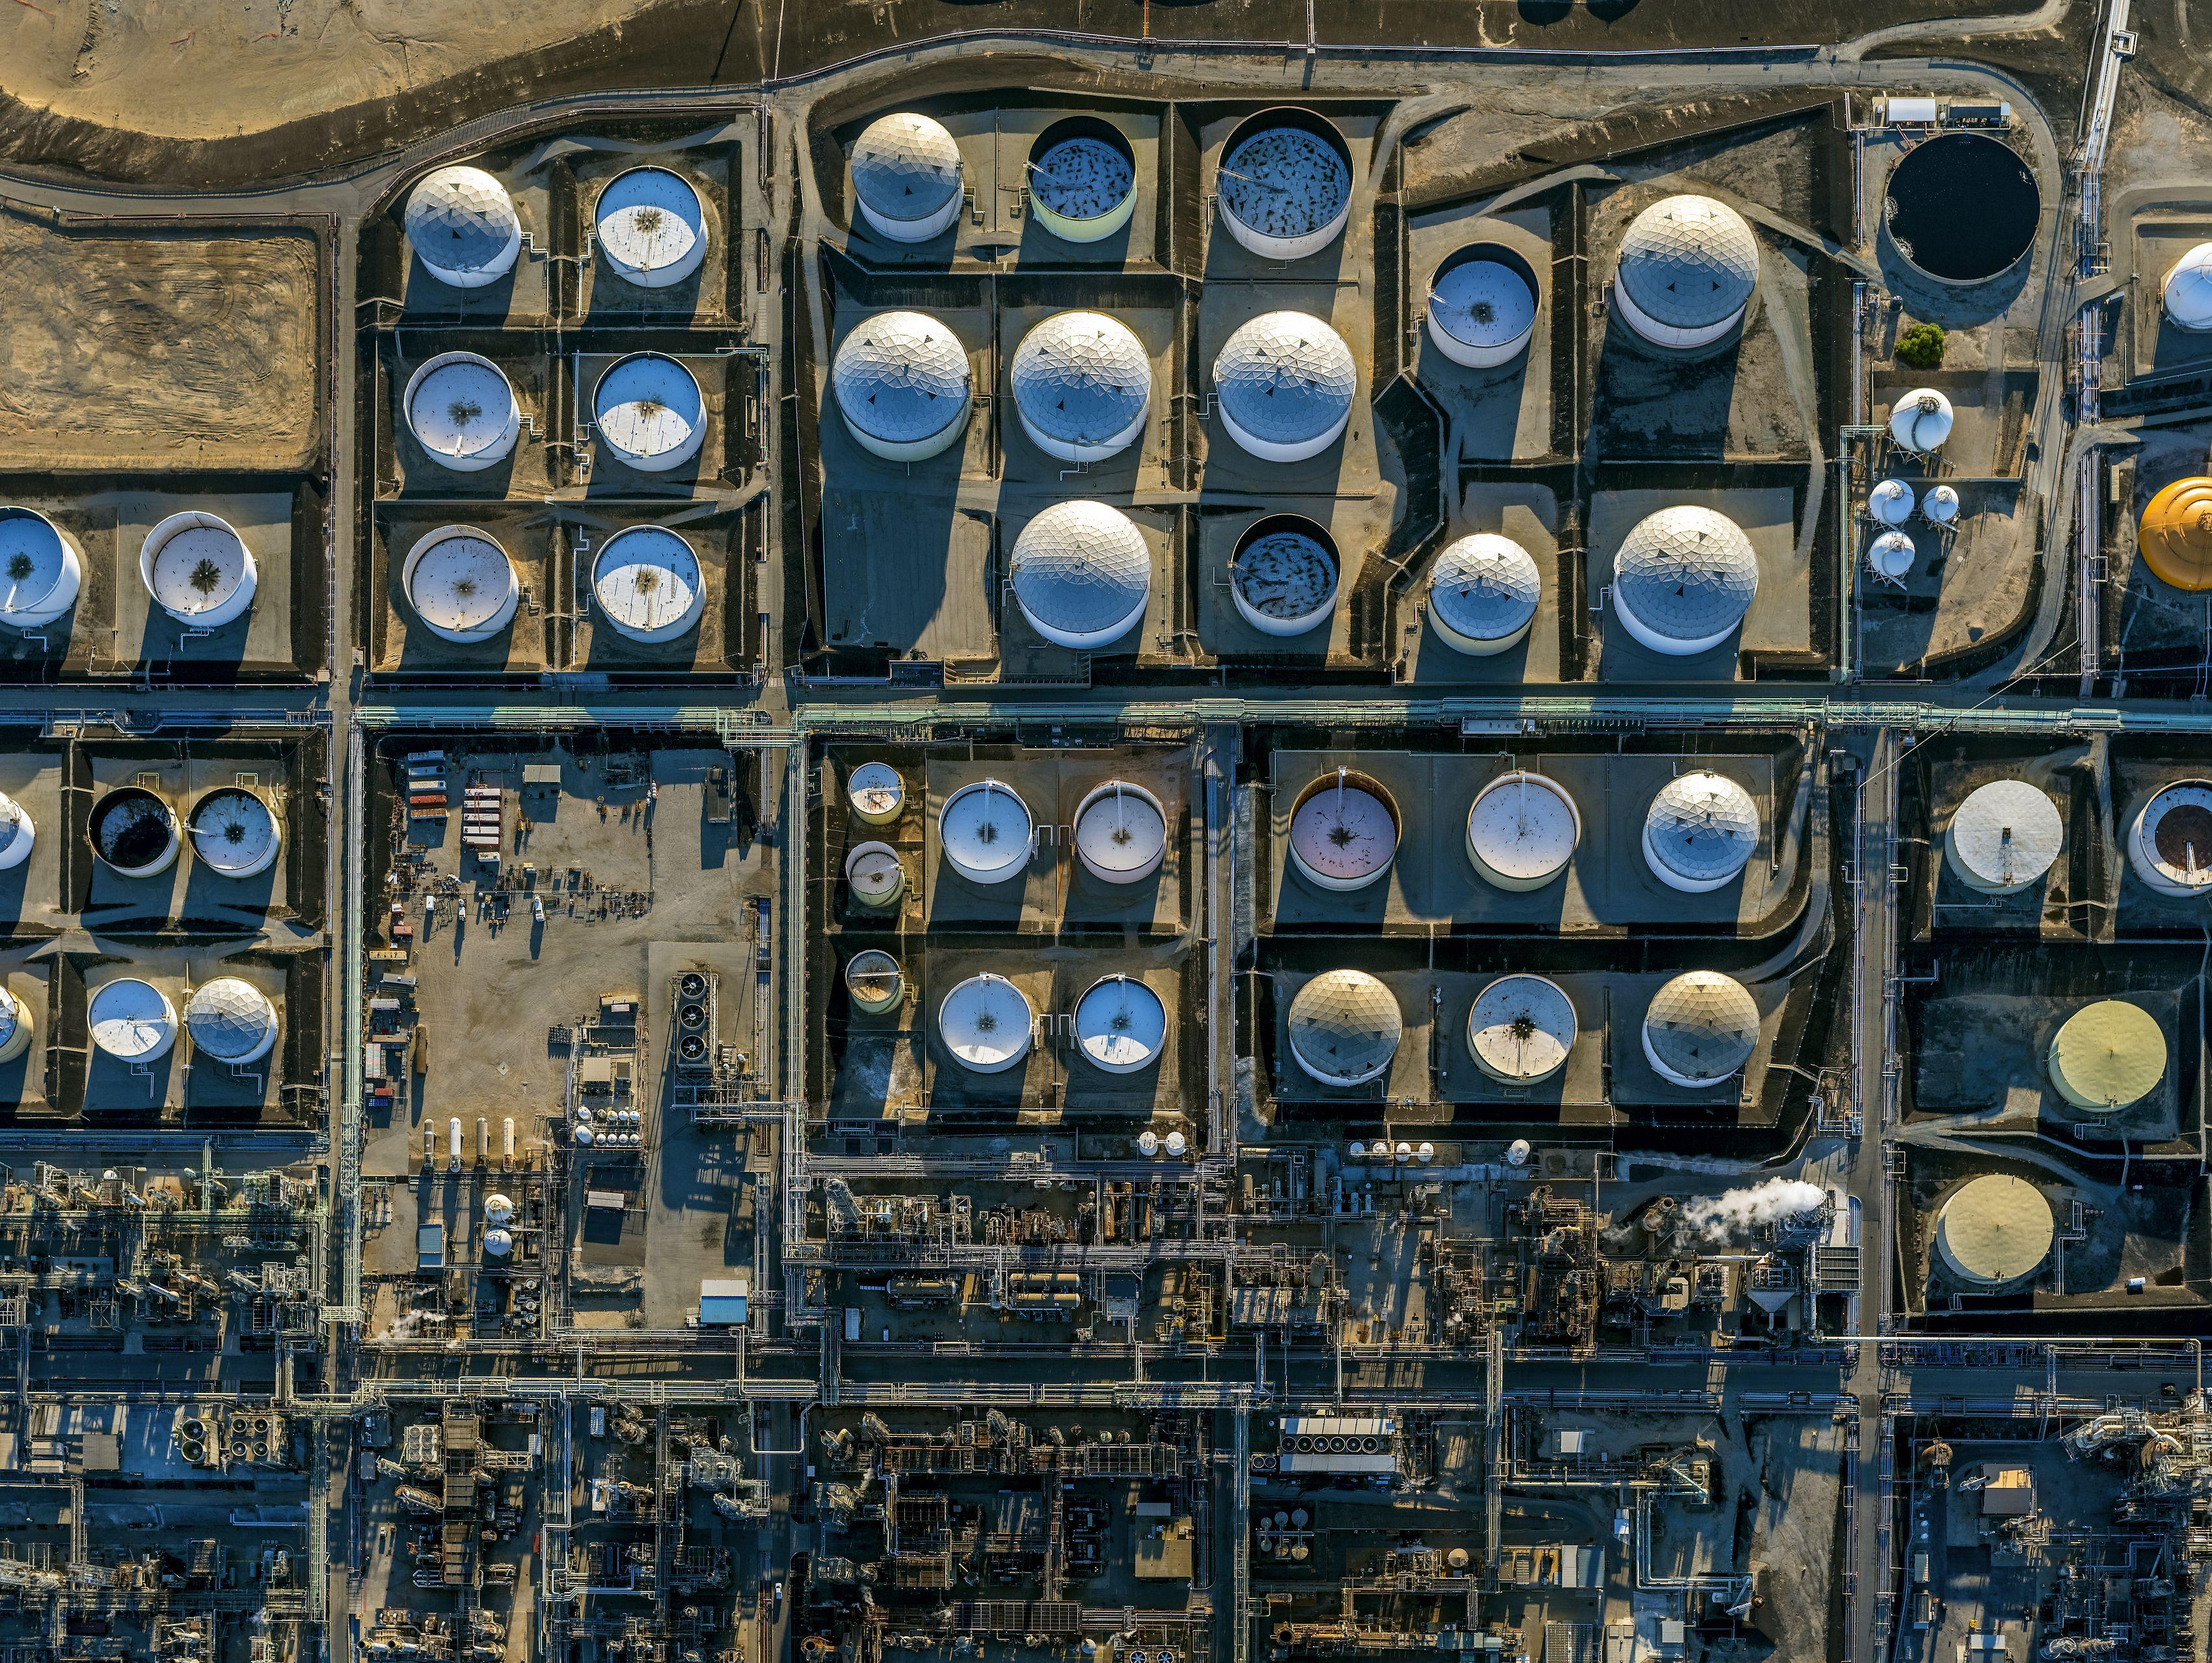 Phillips 66 Los Angeles Refinery, Wilmington, Calif., 2016